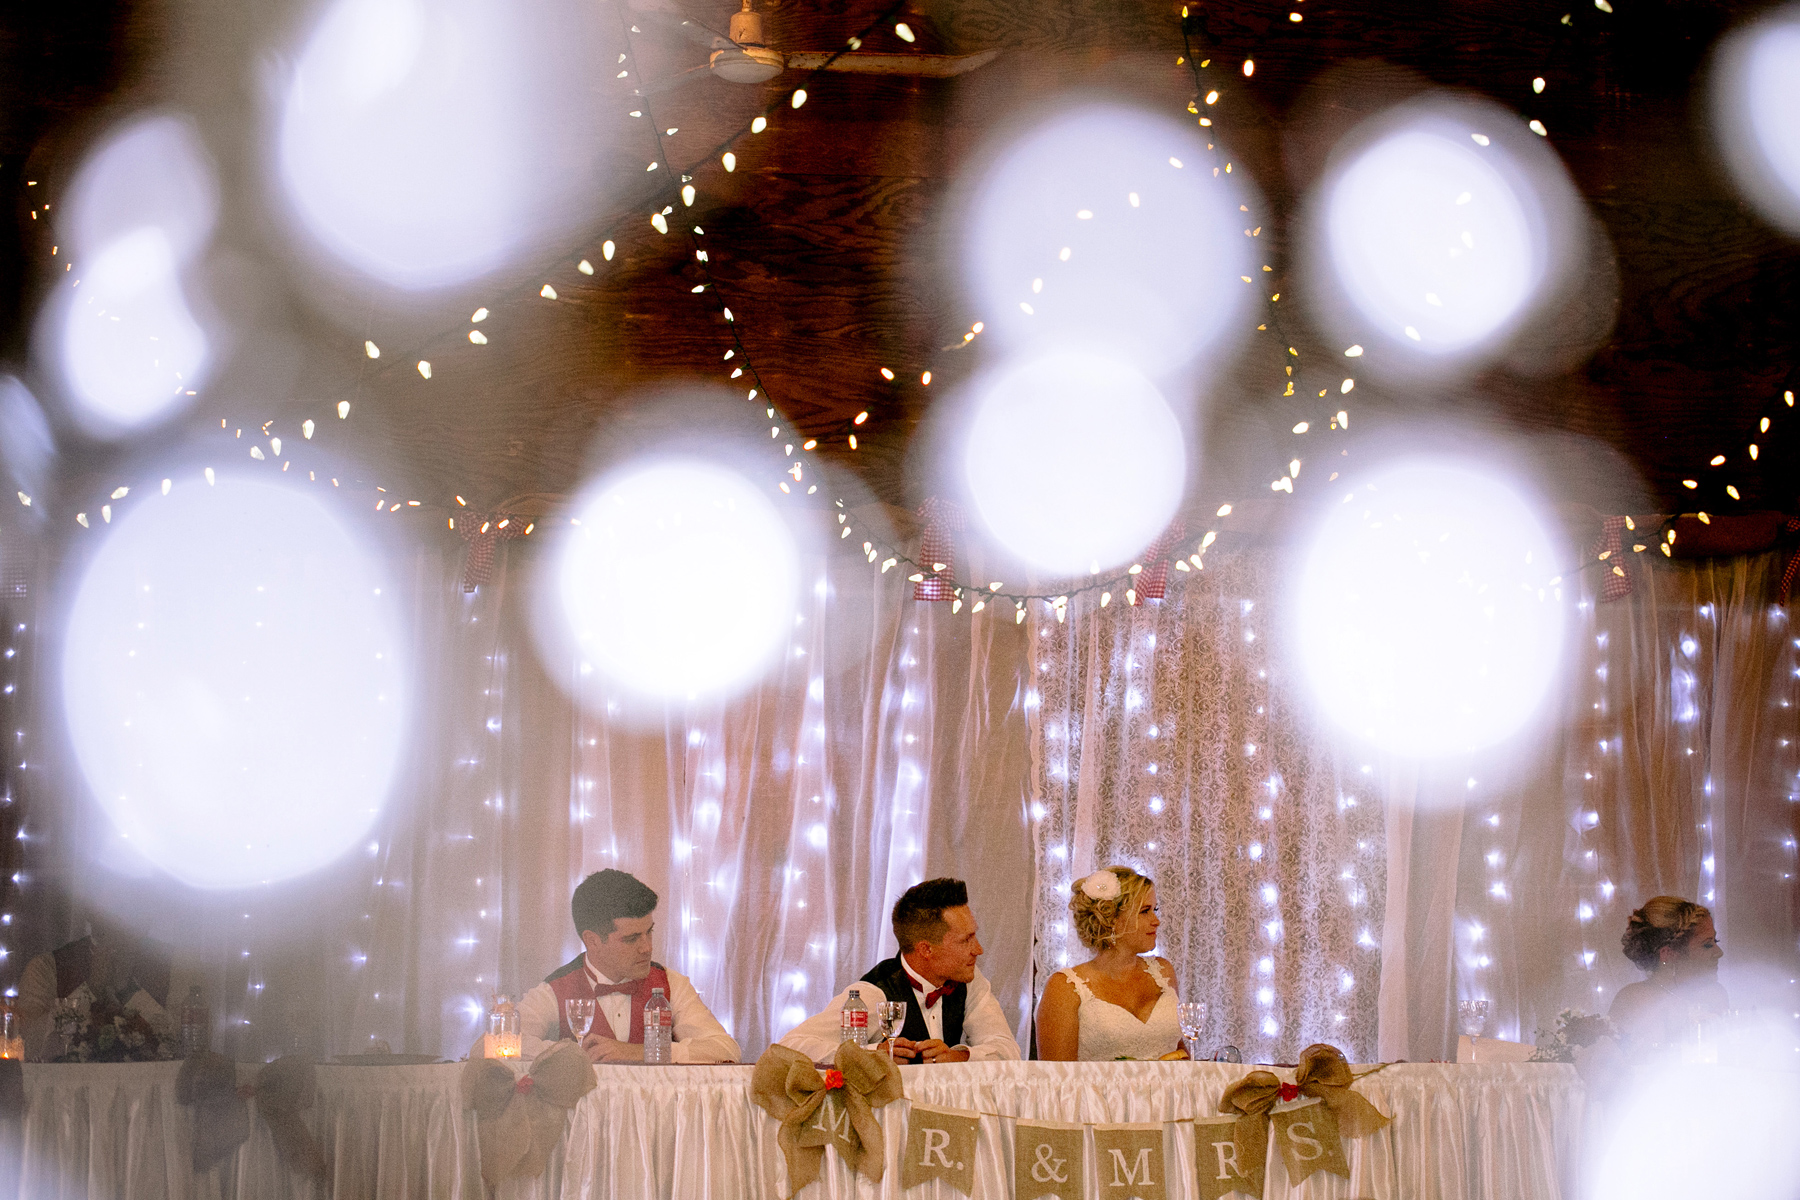 057-awesome-pei-wedding-photography-kandisebrown-jg2016